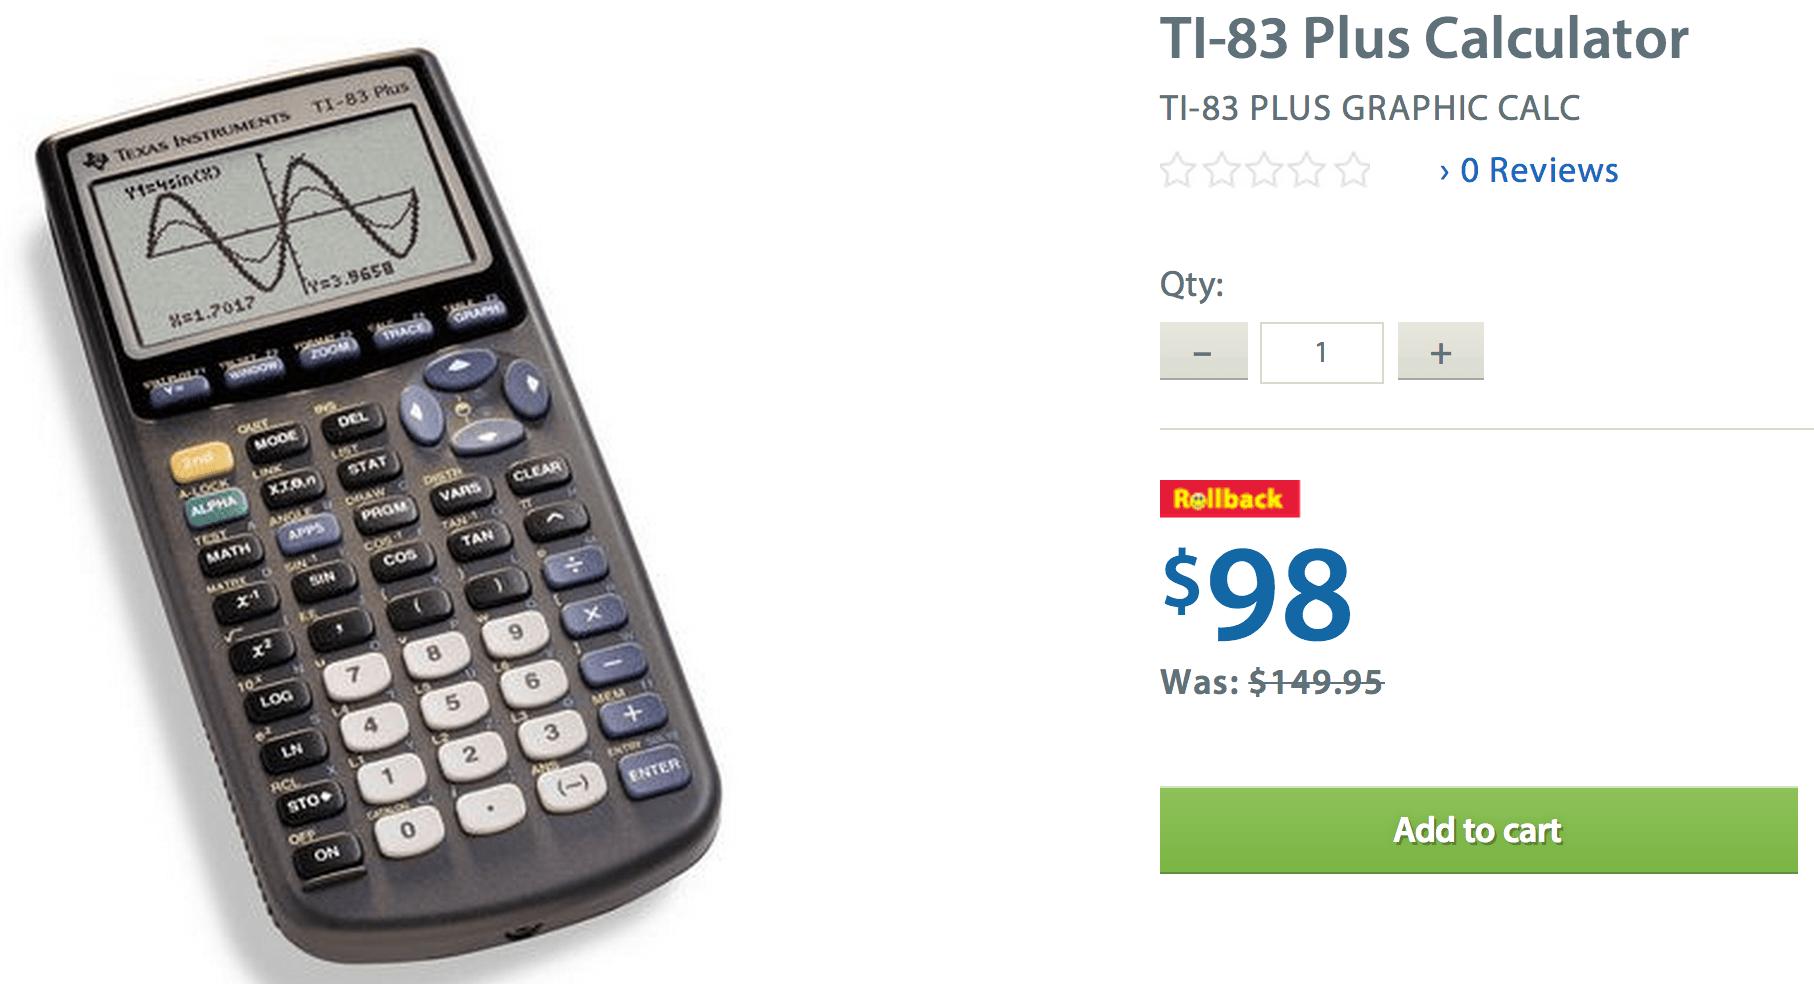 walmart coupons calculator